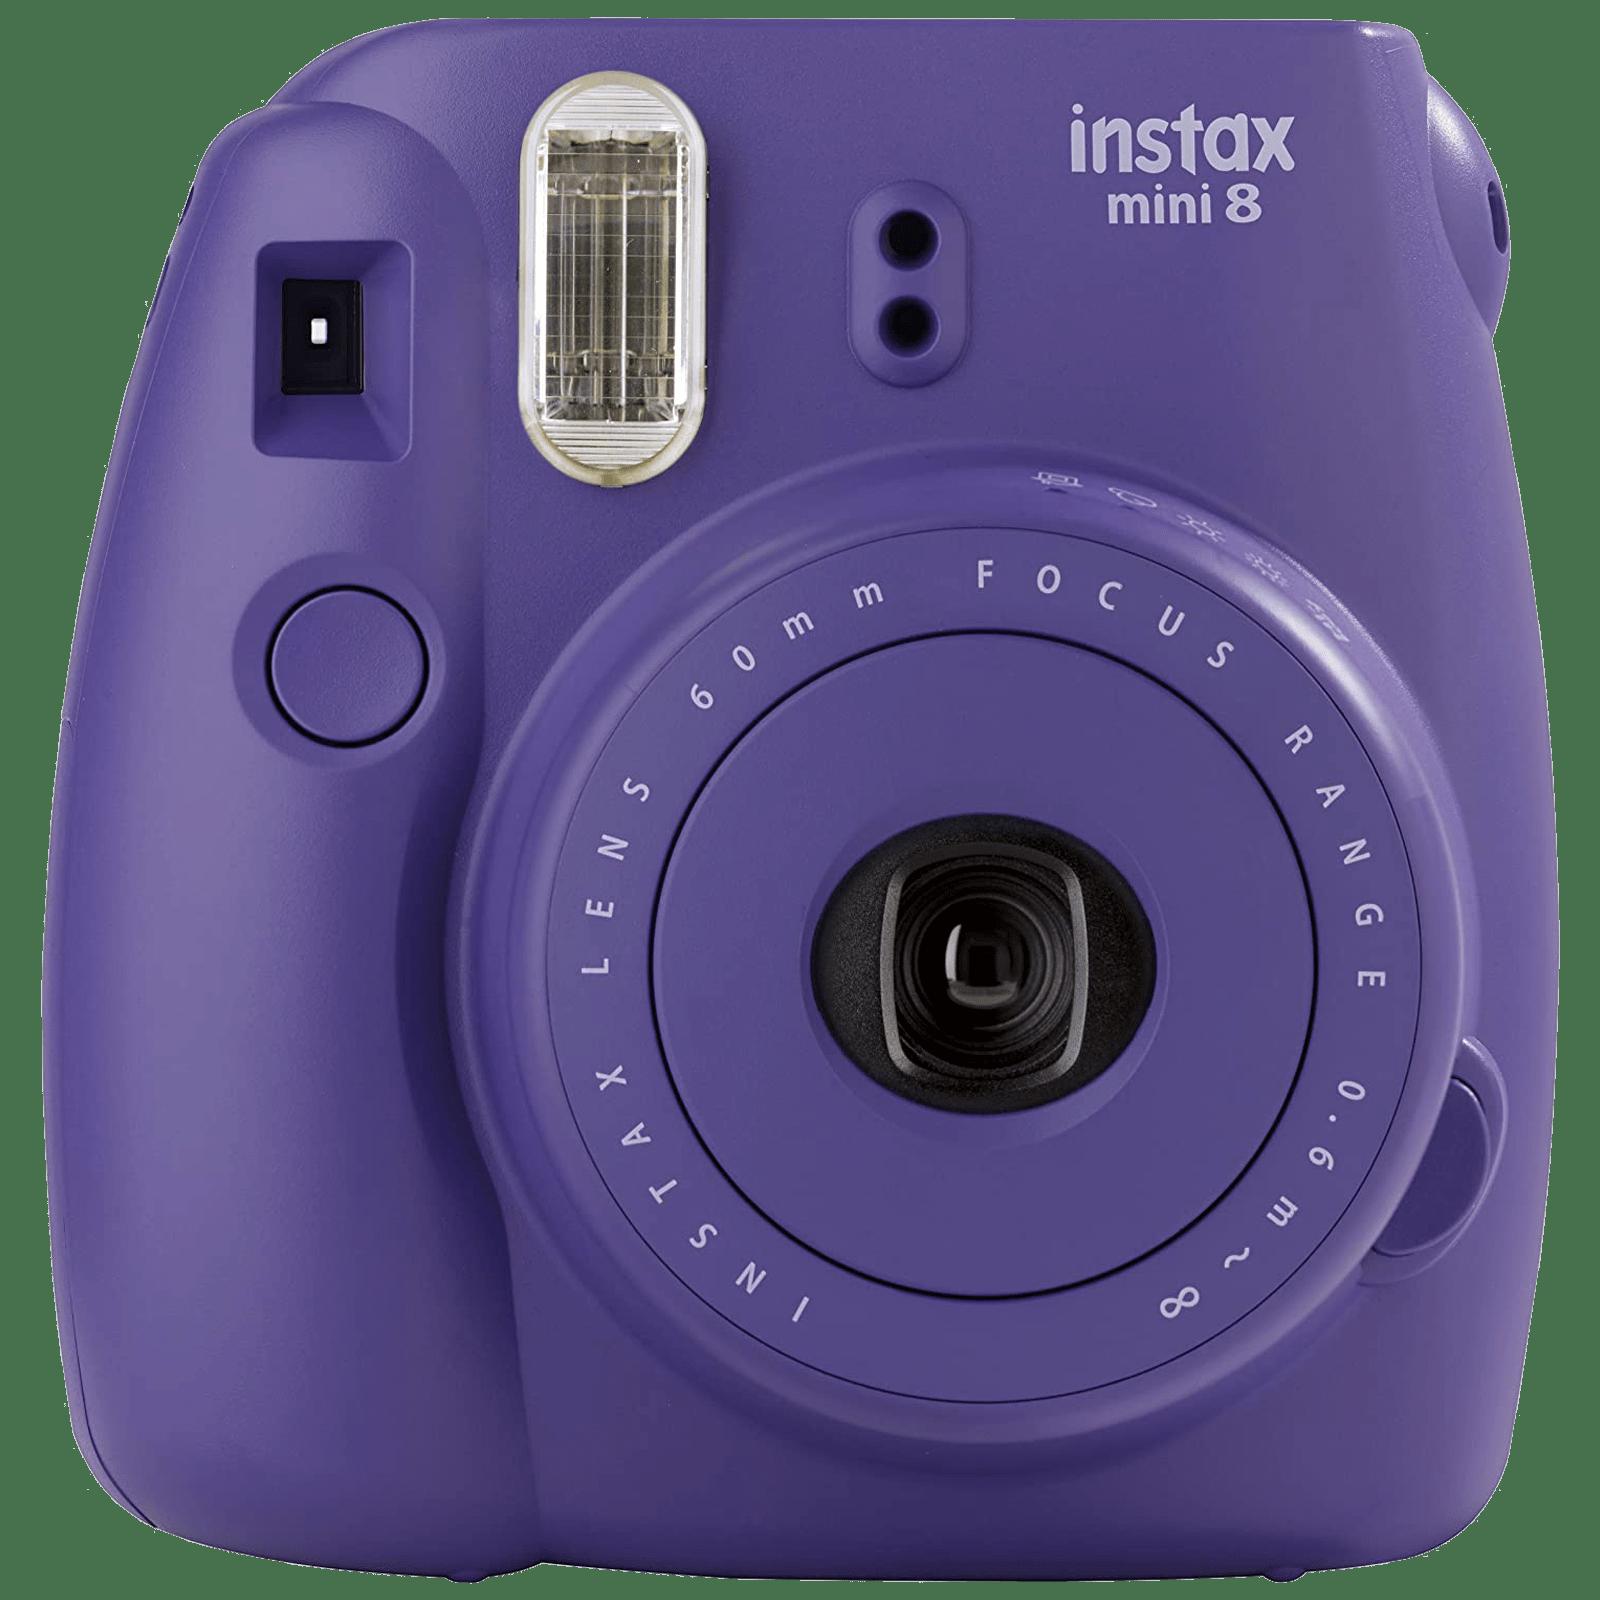 Fujifilm Instax Mini 8 Instant Camera (CMOS Sensor, 16443840, Grape)